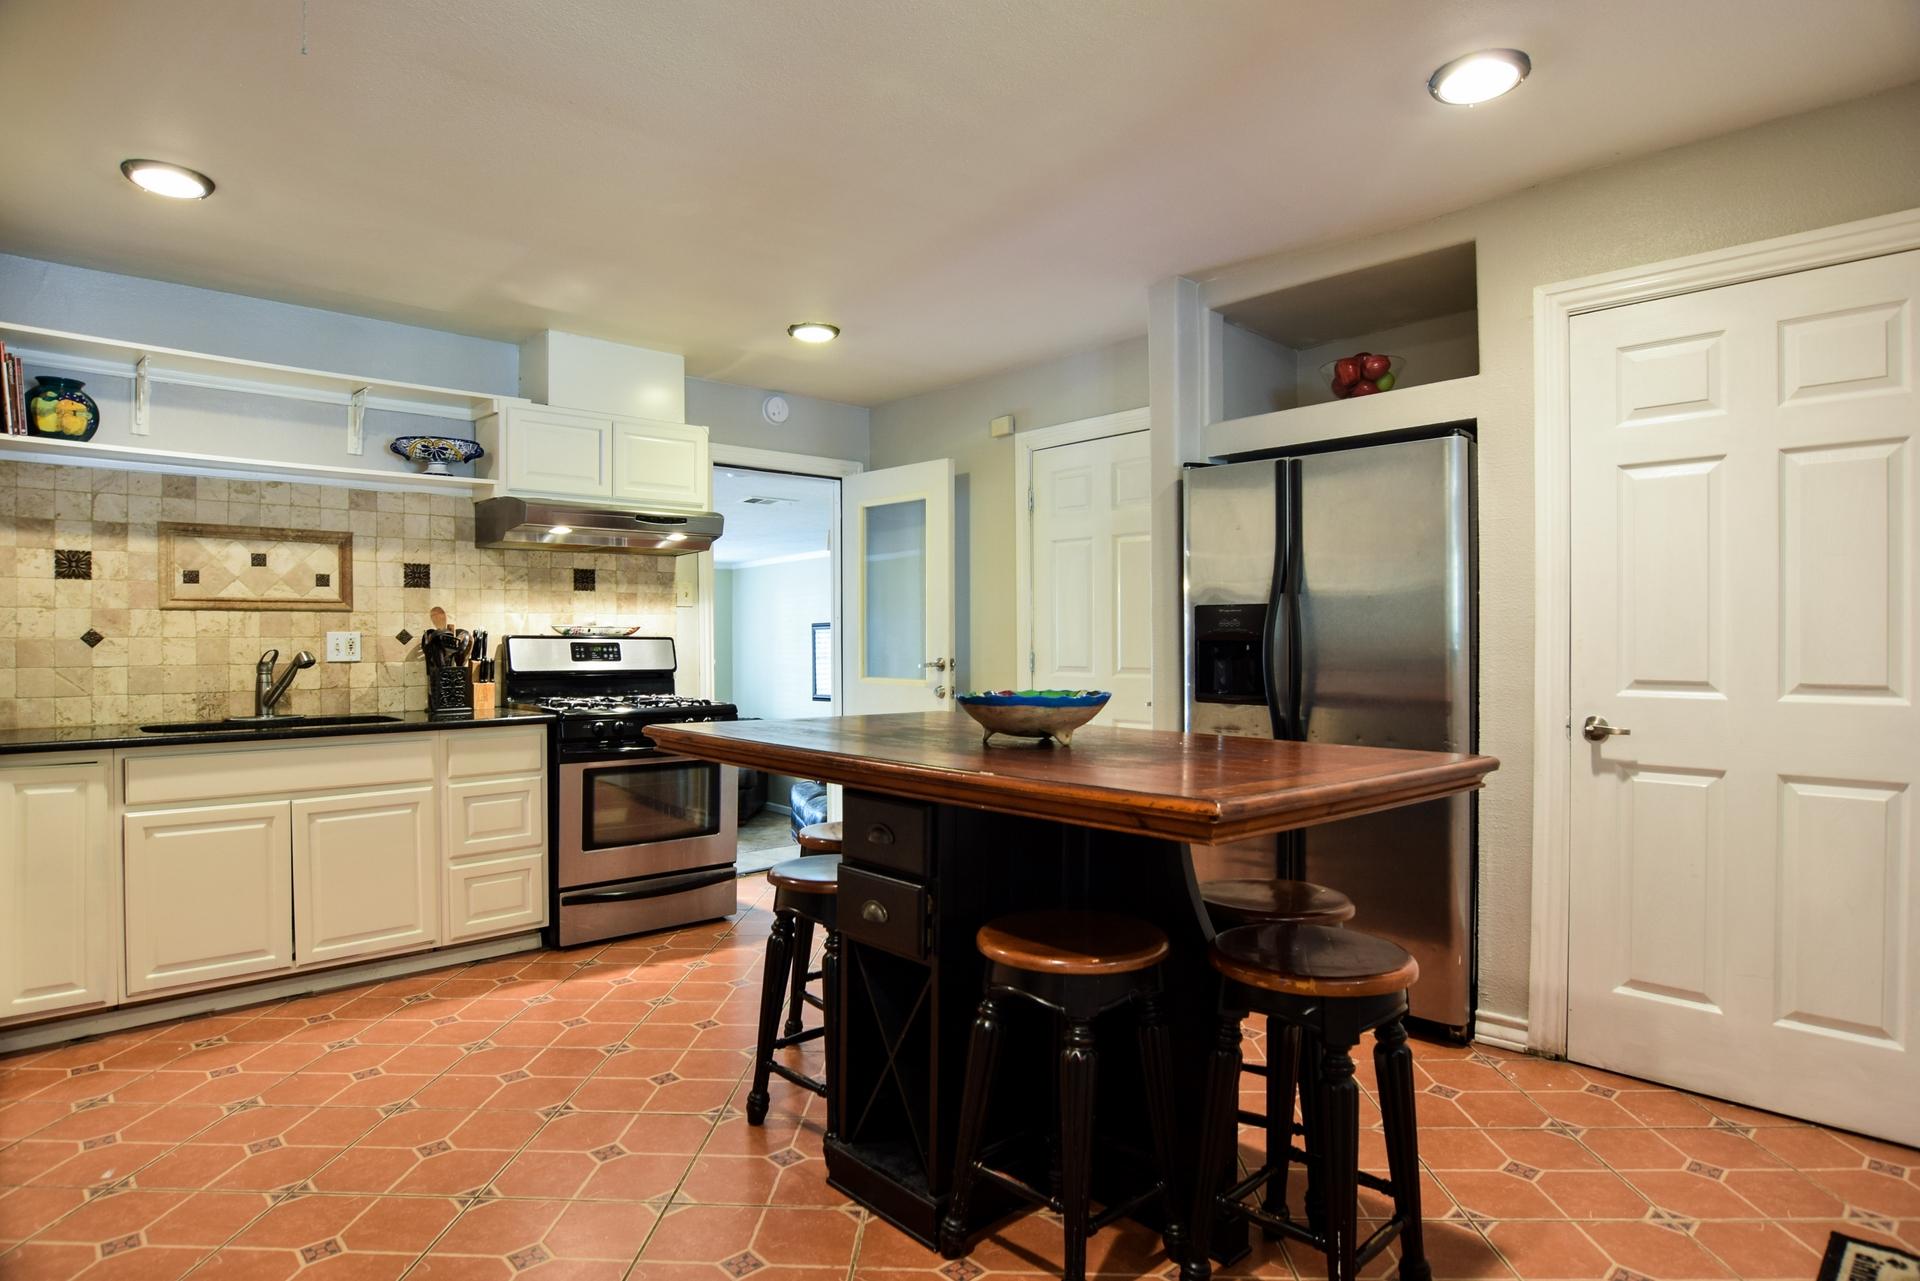 Kitchen1 3112 Catamore Dr Dallas TX 75229.jpg